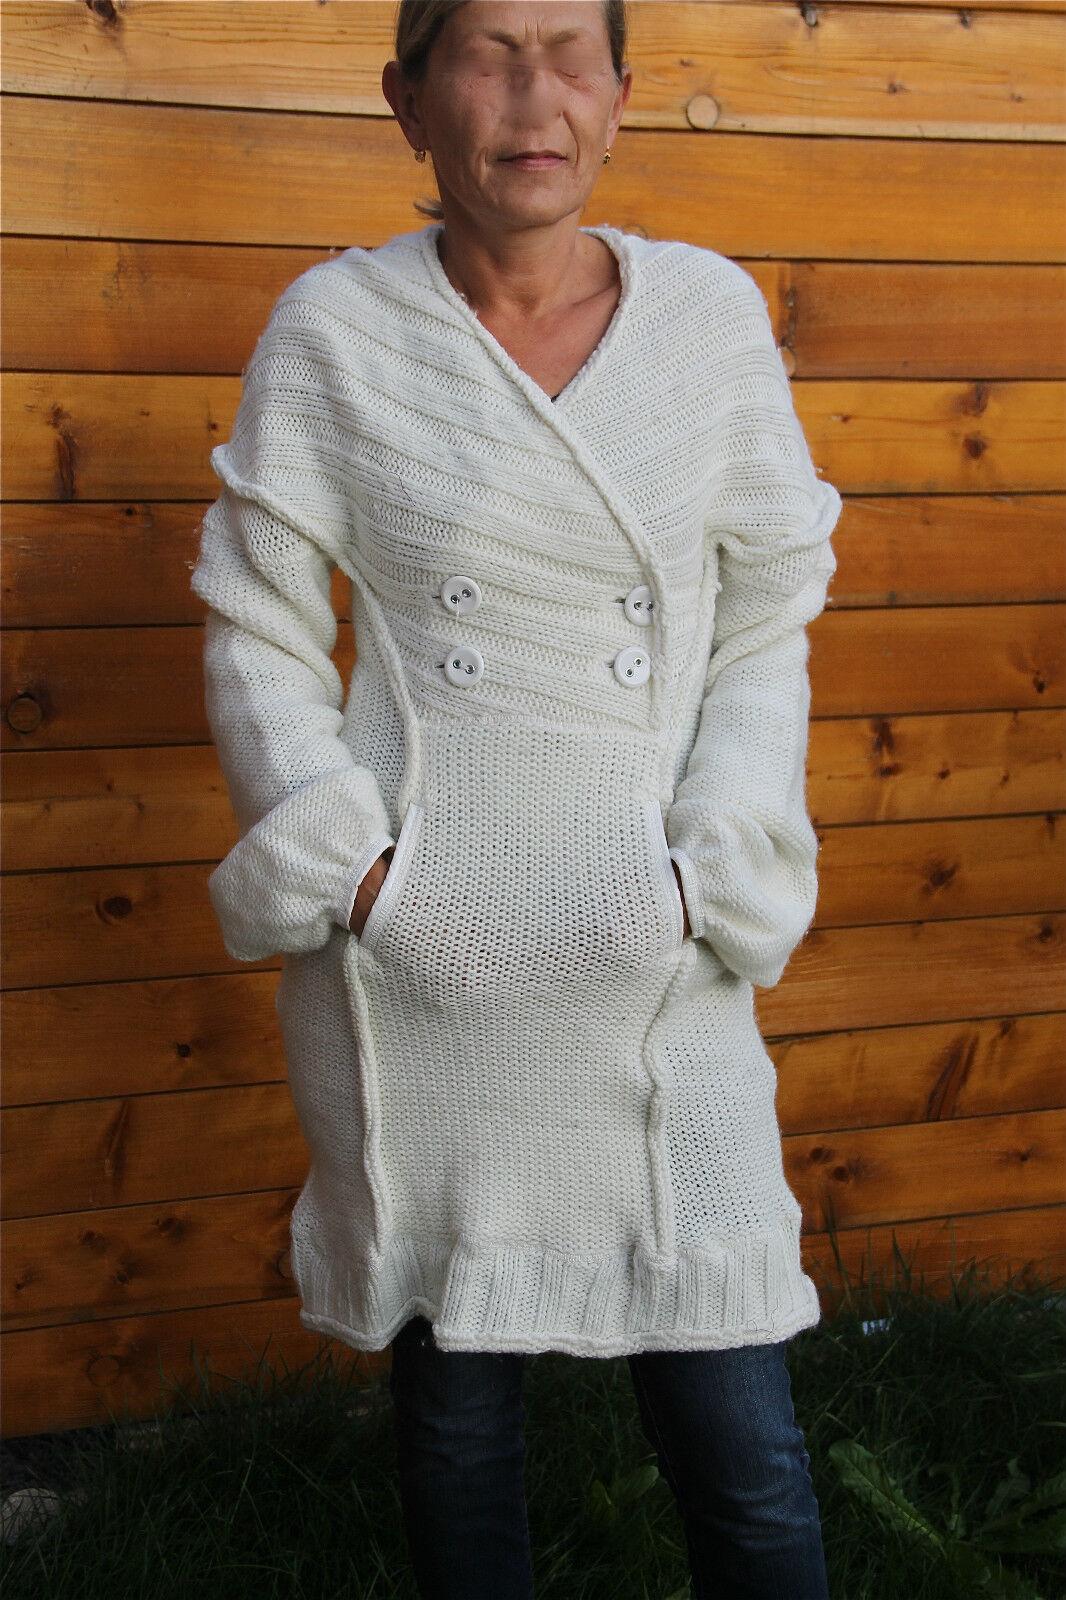 Coat dress wool white MC PLANET T 40 new label TOP RANGE val